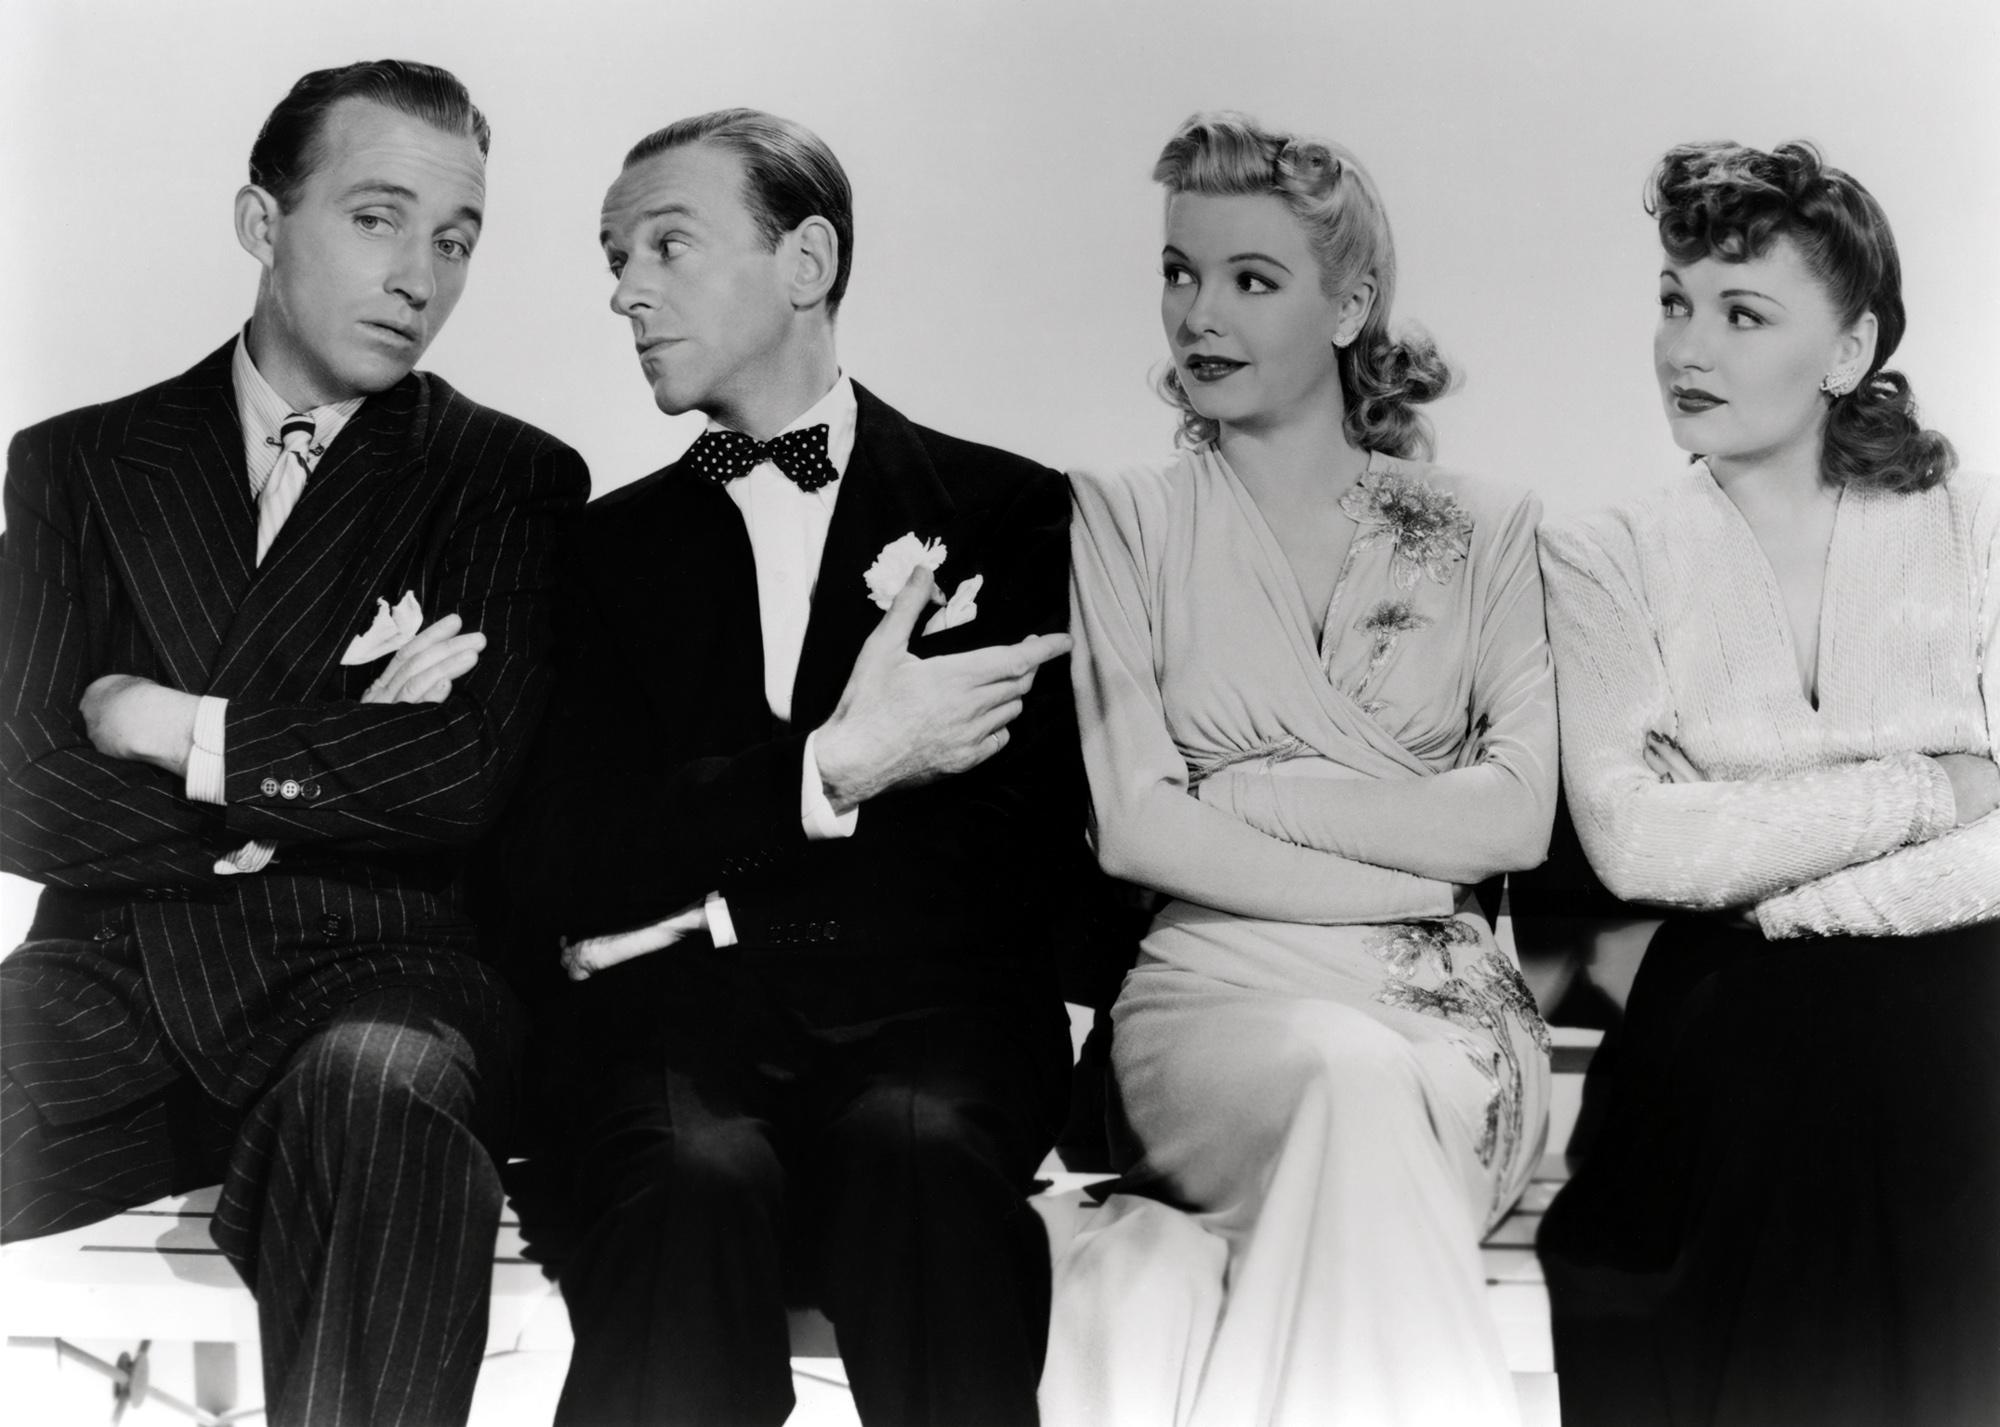 Marjorie Reynolds in Holiday Inn (L to R) Bing Crosby, Fred Astaire, Marjorie Reynolds, Virginia Dale